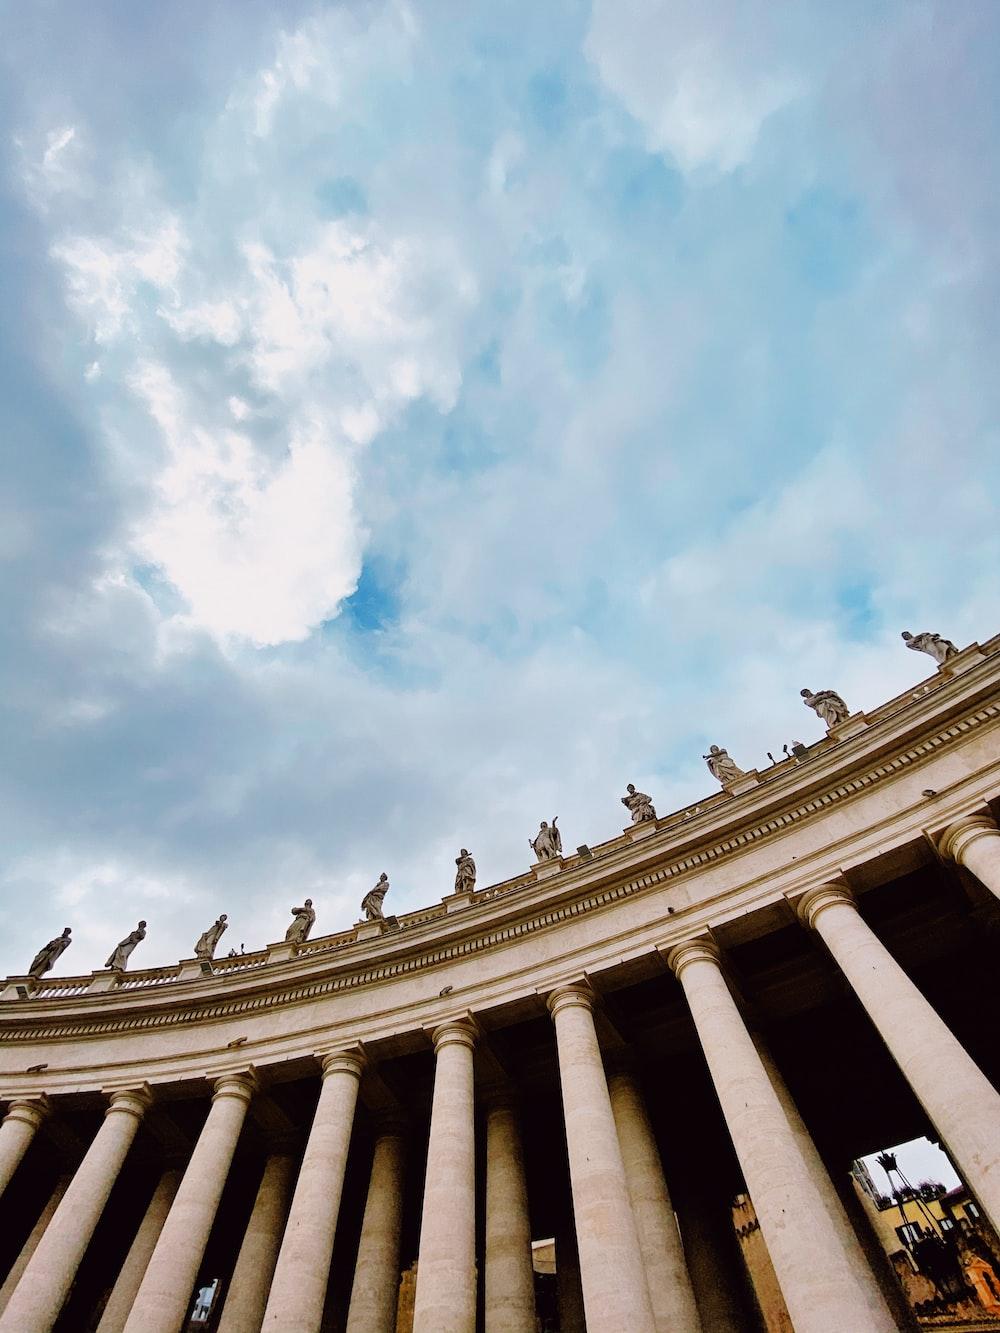 Corinthians columns under white clouds